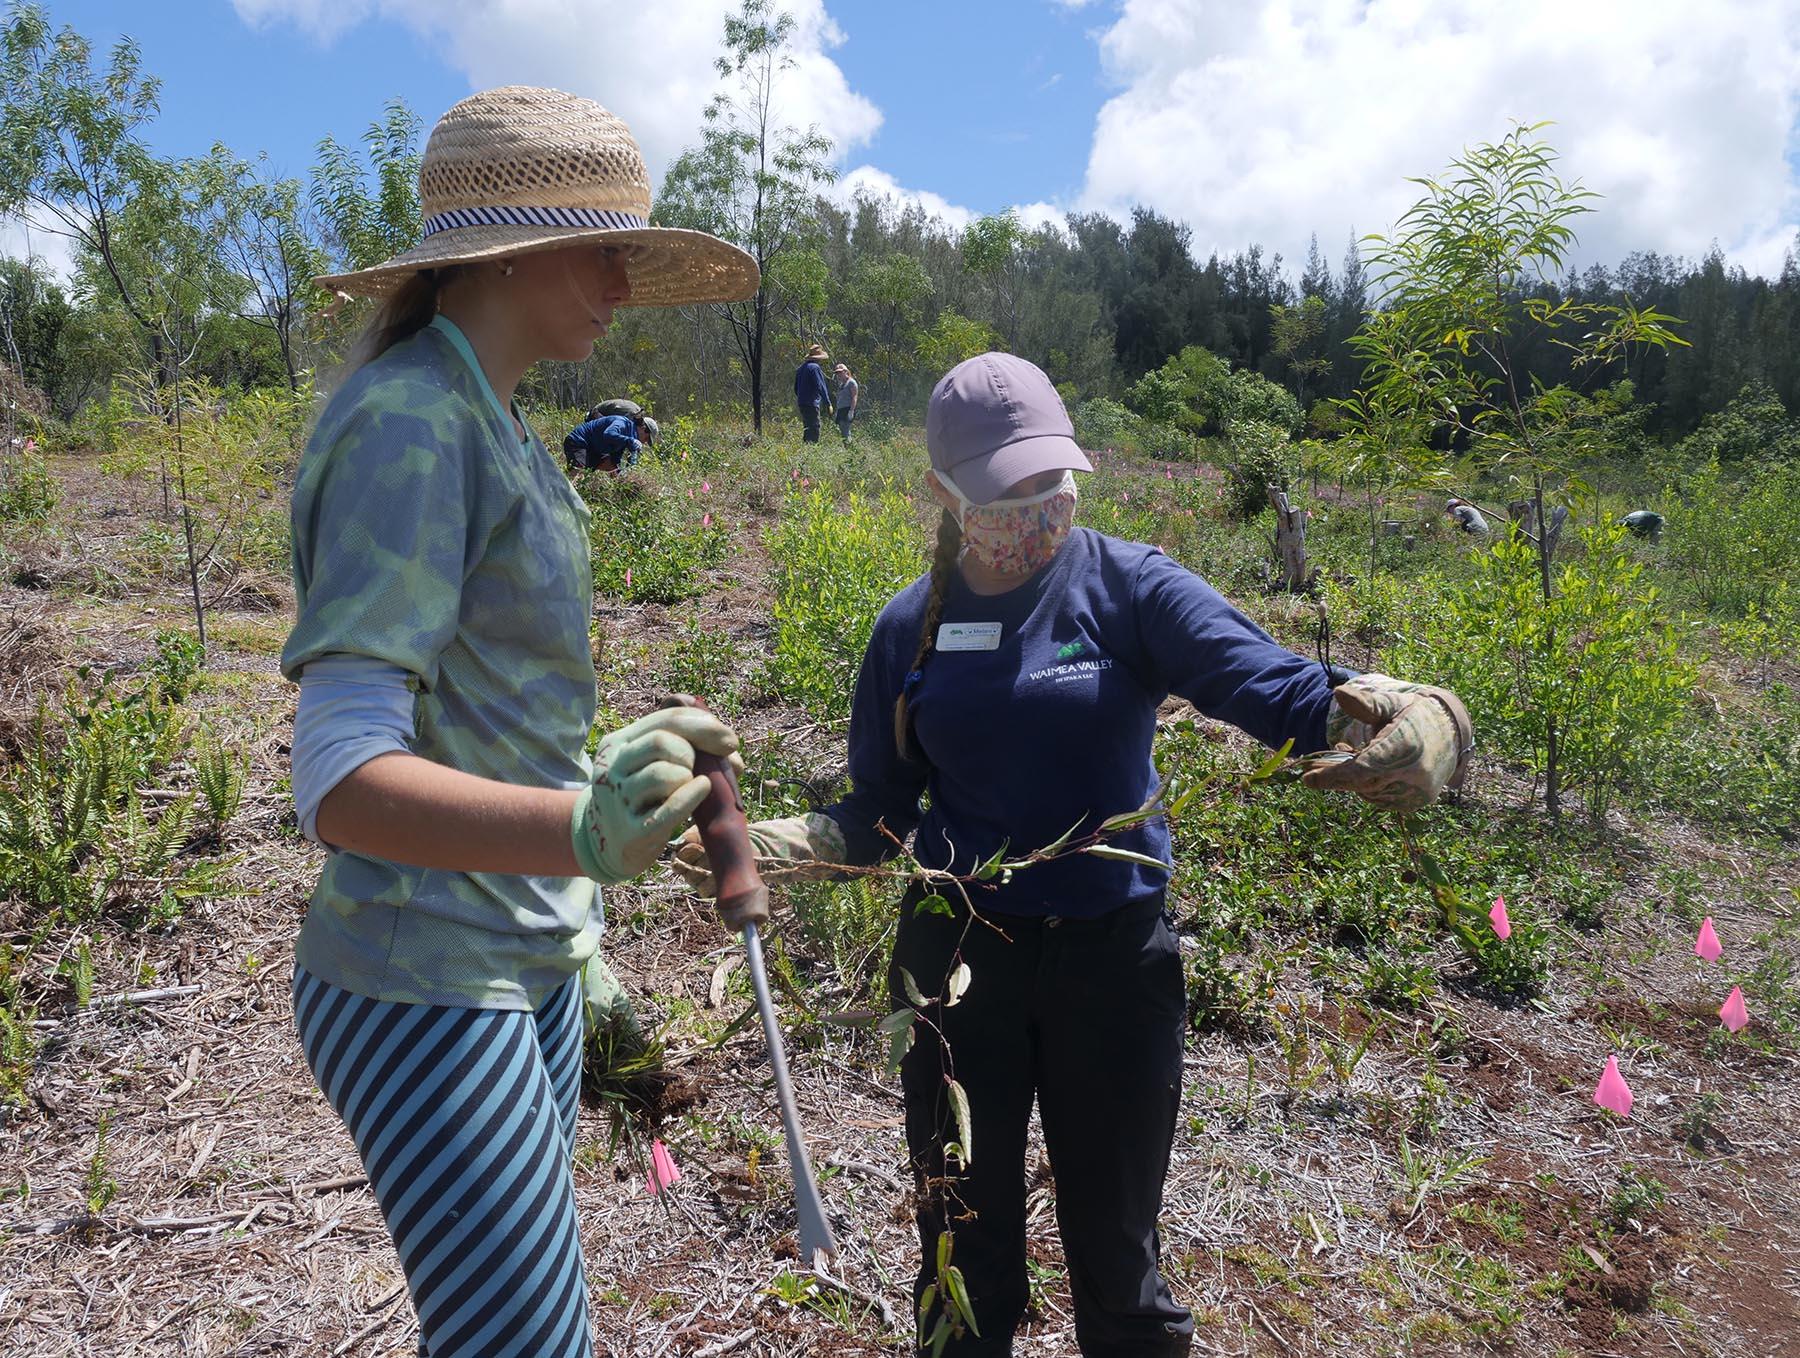 <p>Melanie Spielman, right, explains the growth pattern of an invasive weed to volunteer Marley Beschem of Waialua High School.</p>